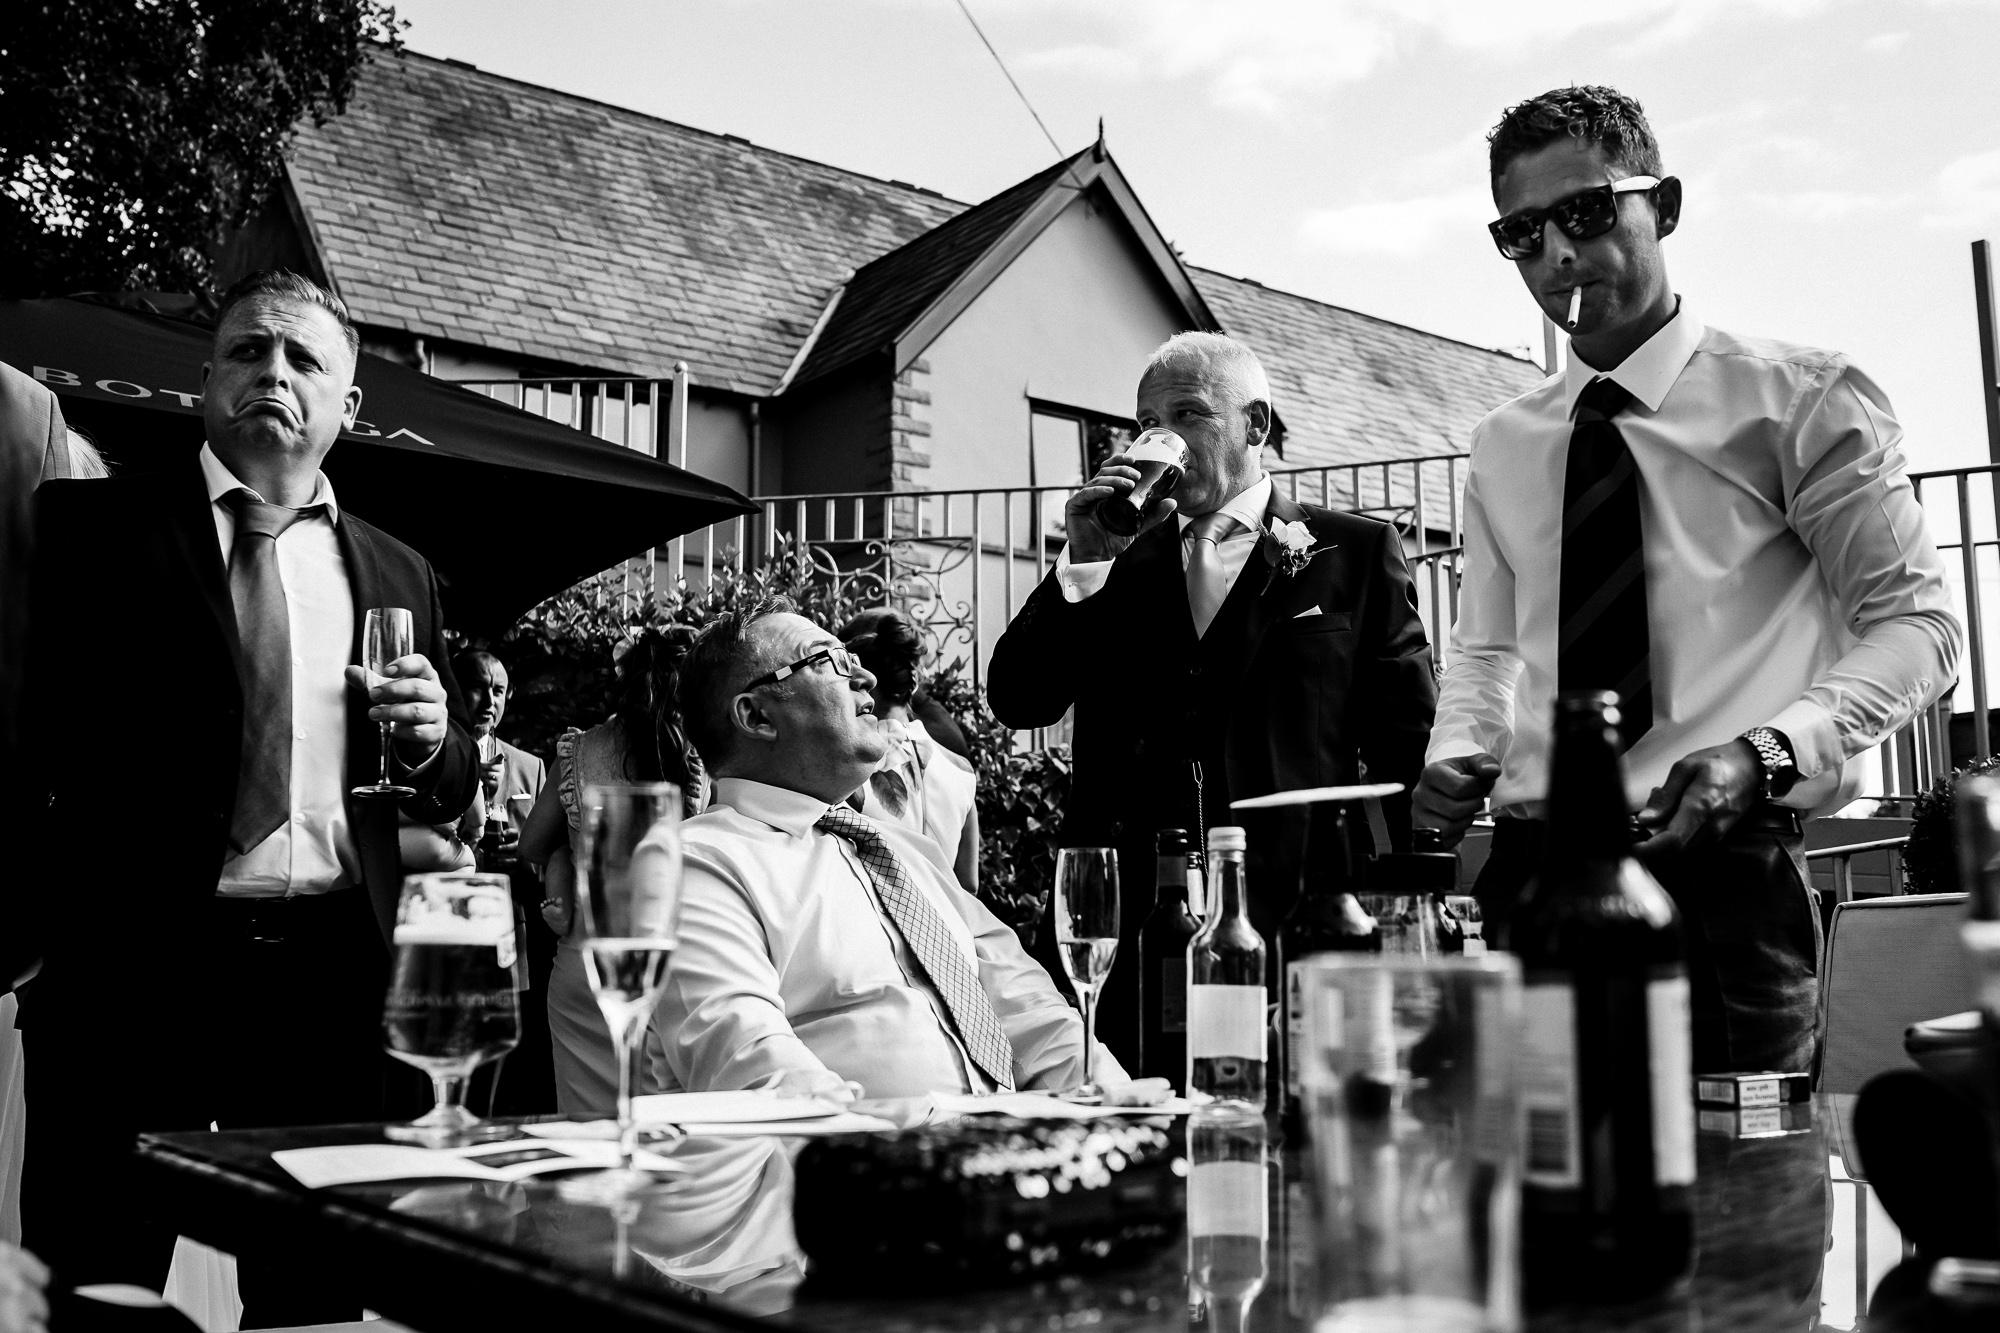 West Tower Wedding Photographer Ormskirk Lancashire wedding photography (28 of 57).jpg